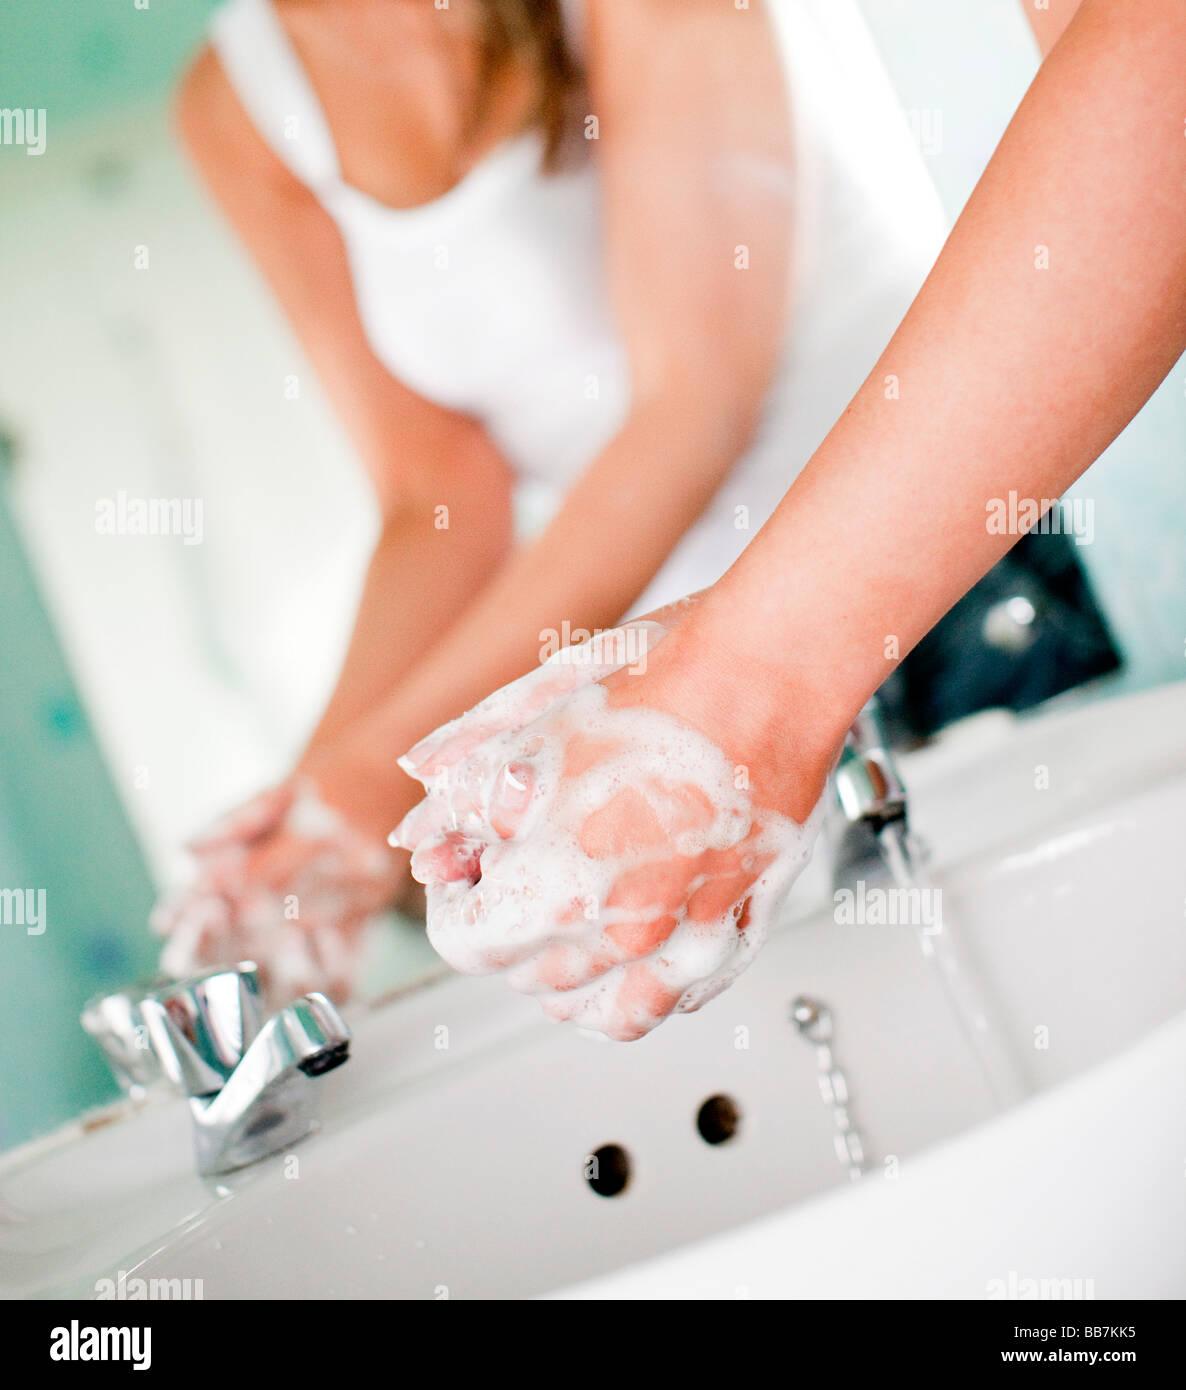 Woman washing hands Photo Stock